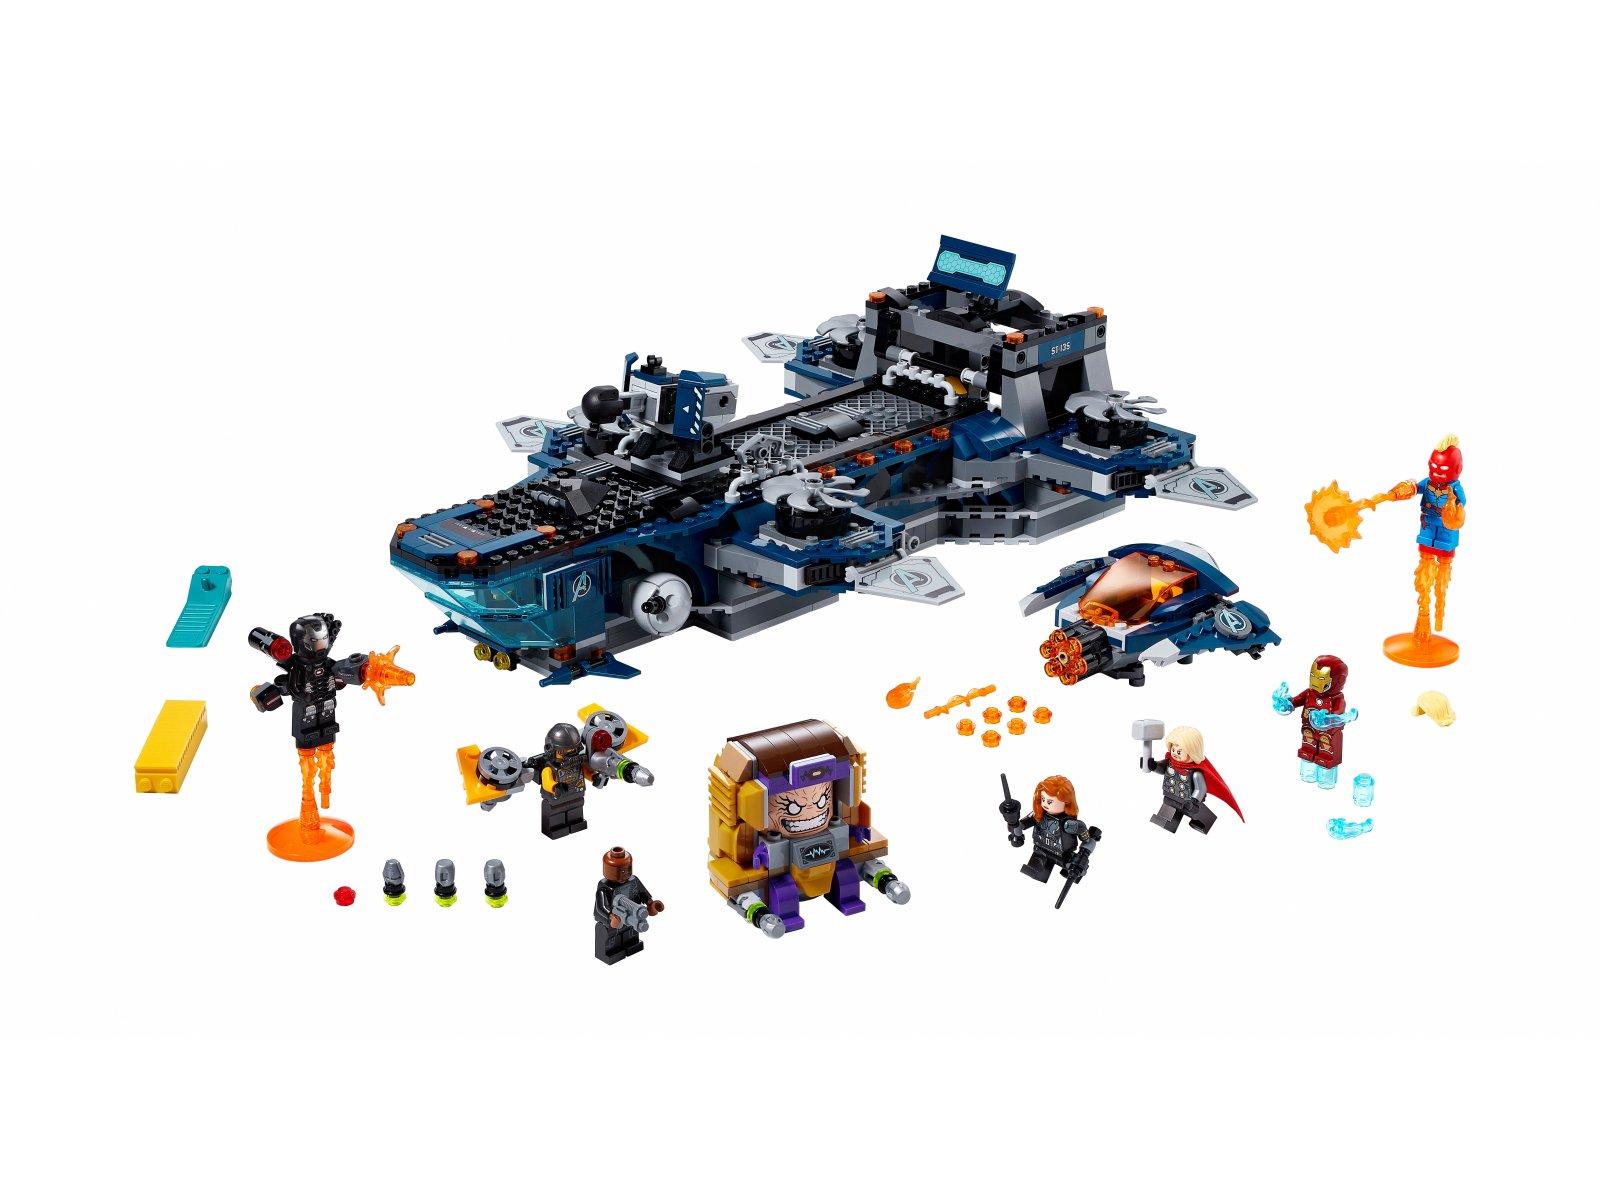 LEGO 76153 Marvel Avengers Avengers Lotniskowiec